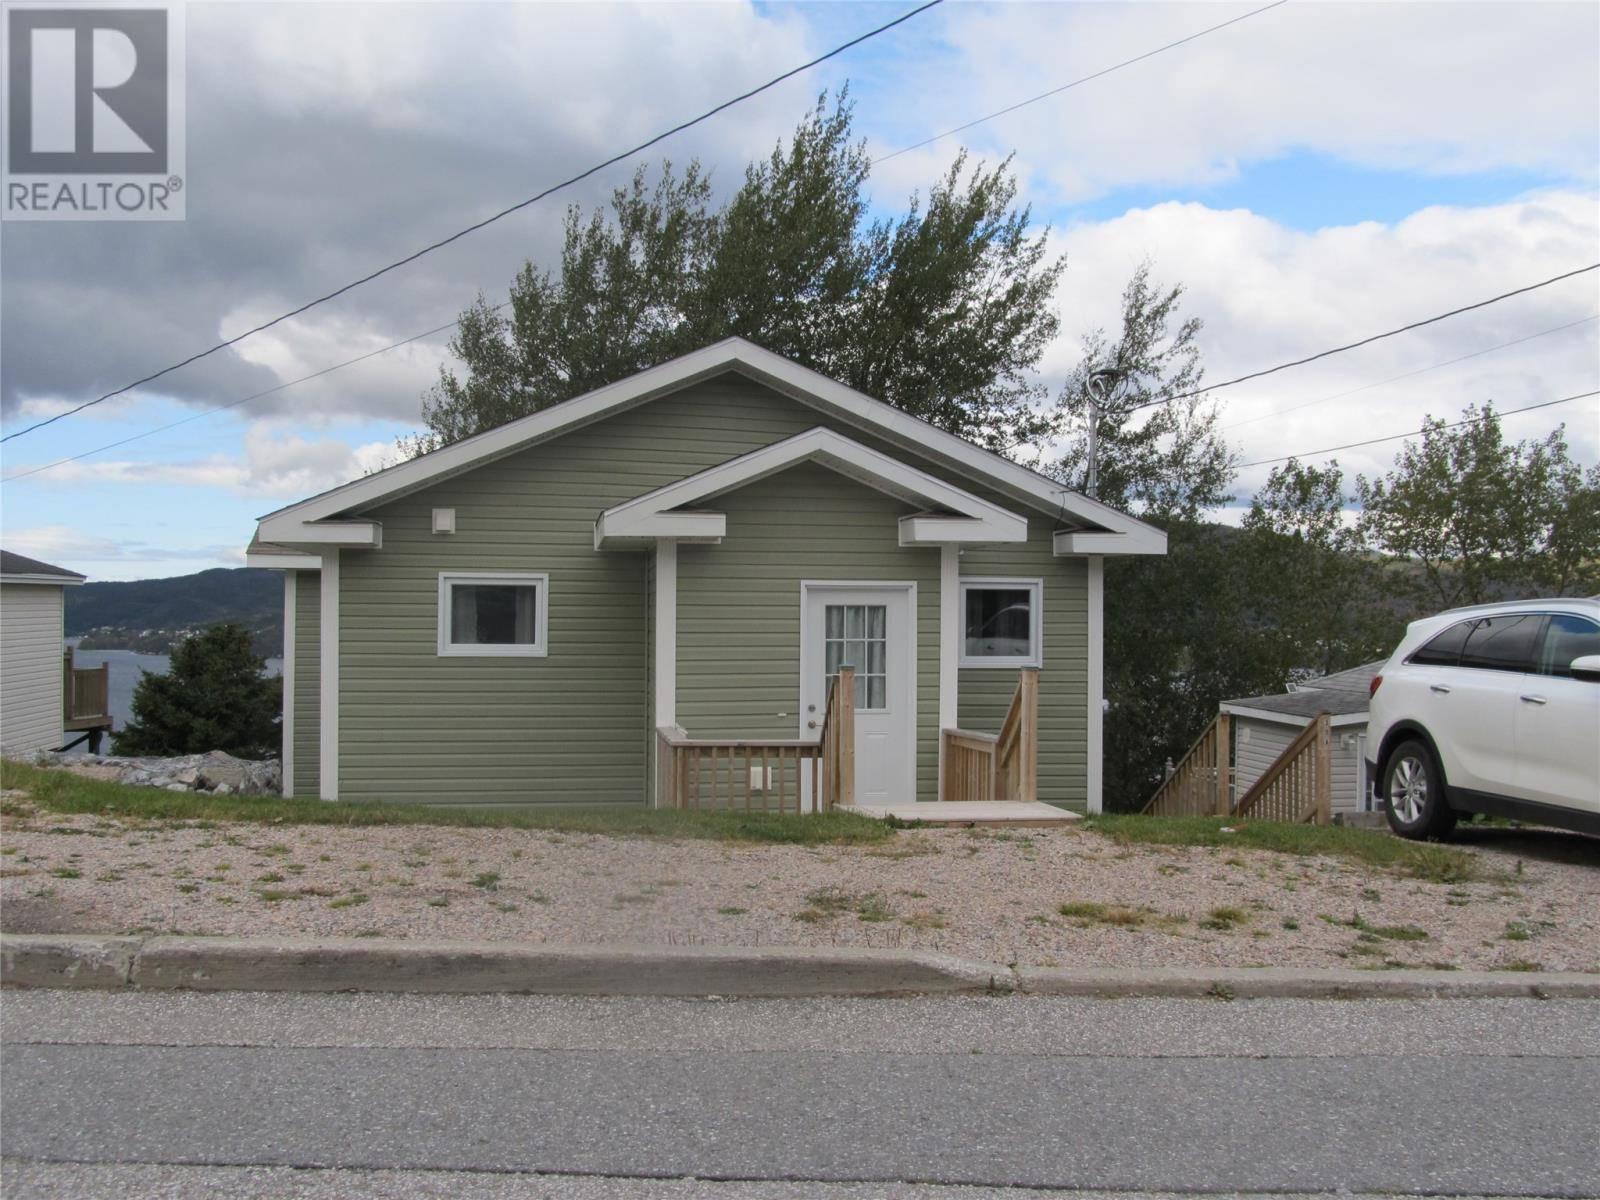 House for sale at 39 Princess Ave Corner Brook Newfoundland - MLS: 1204930